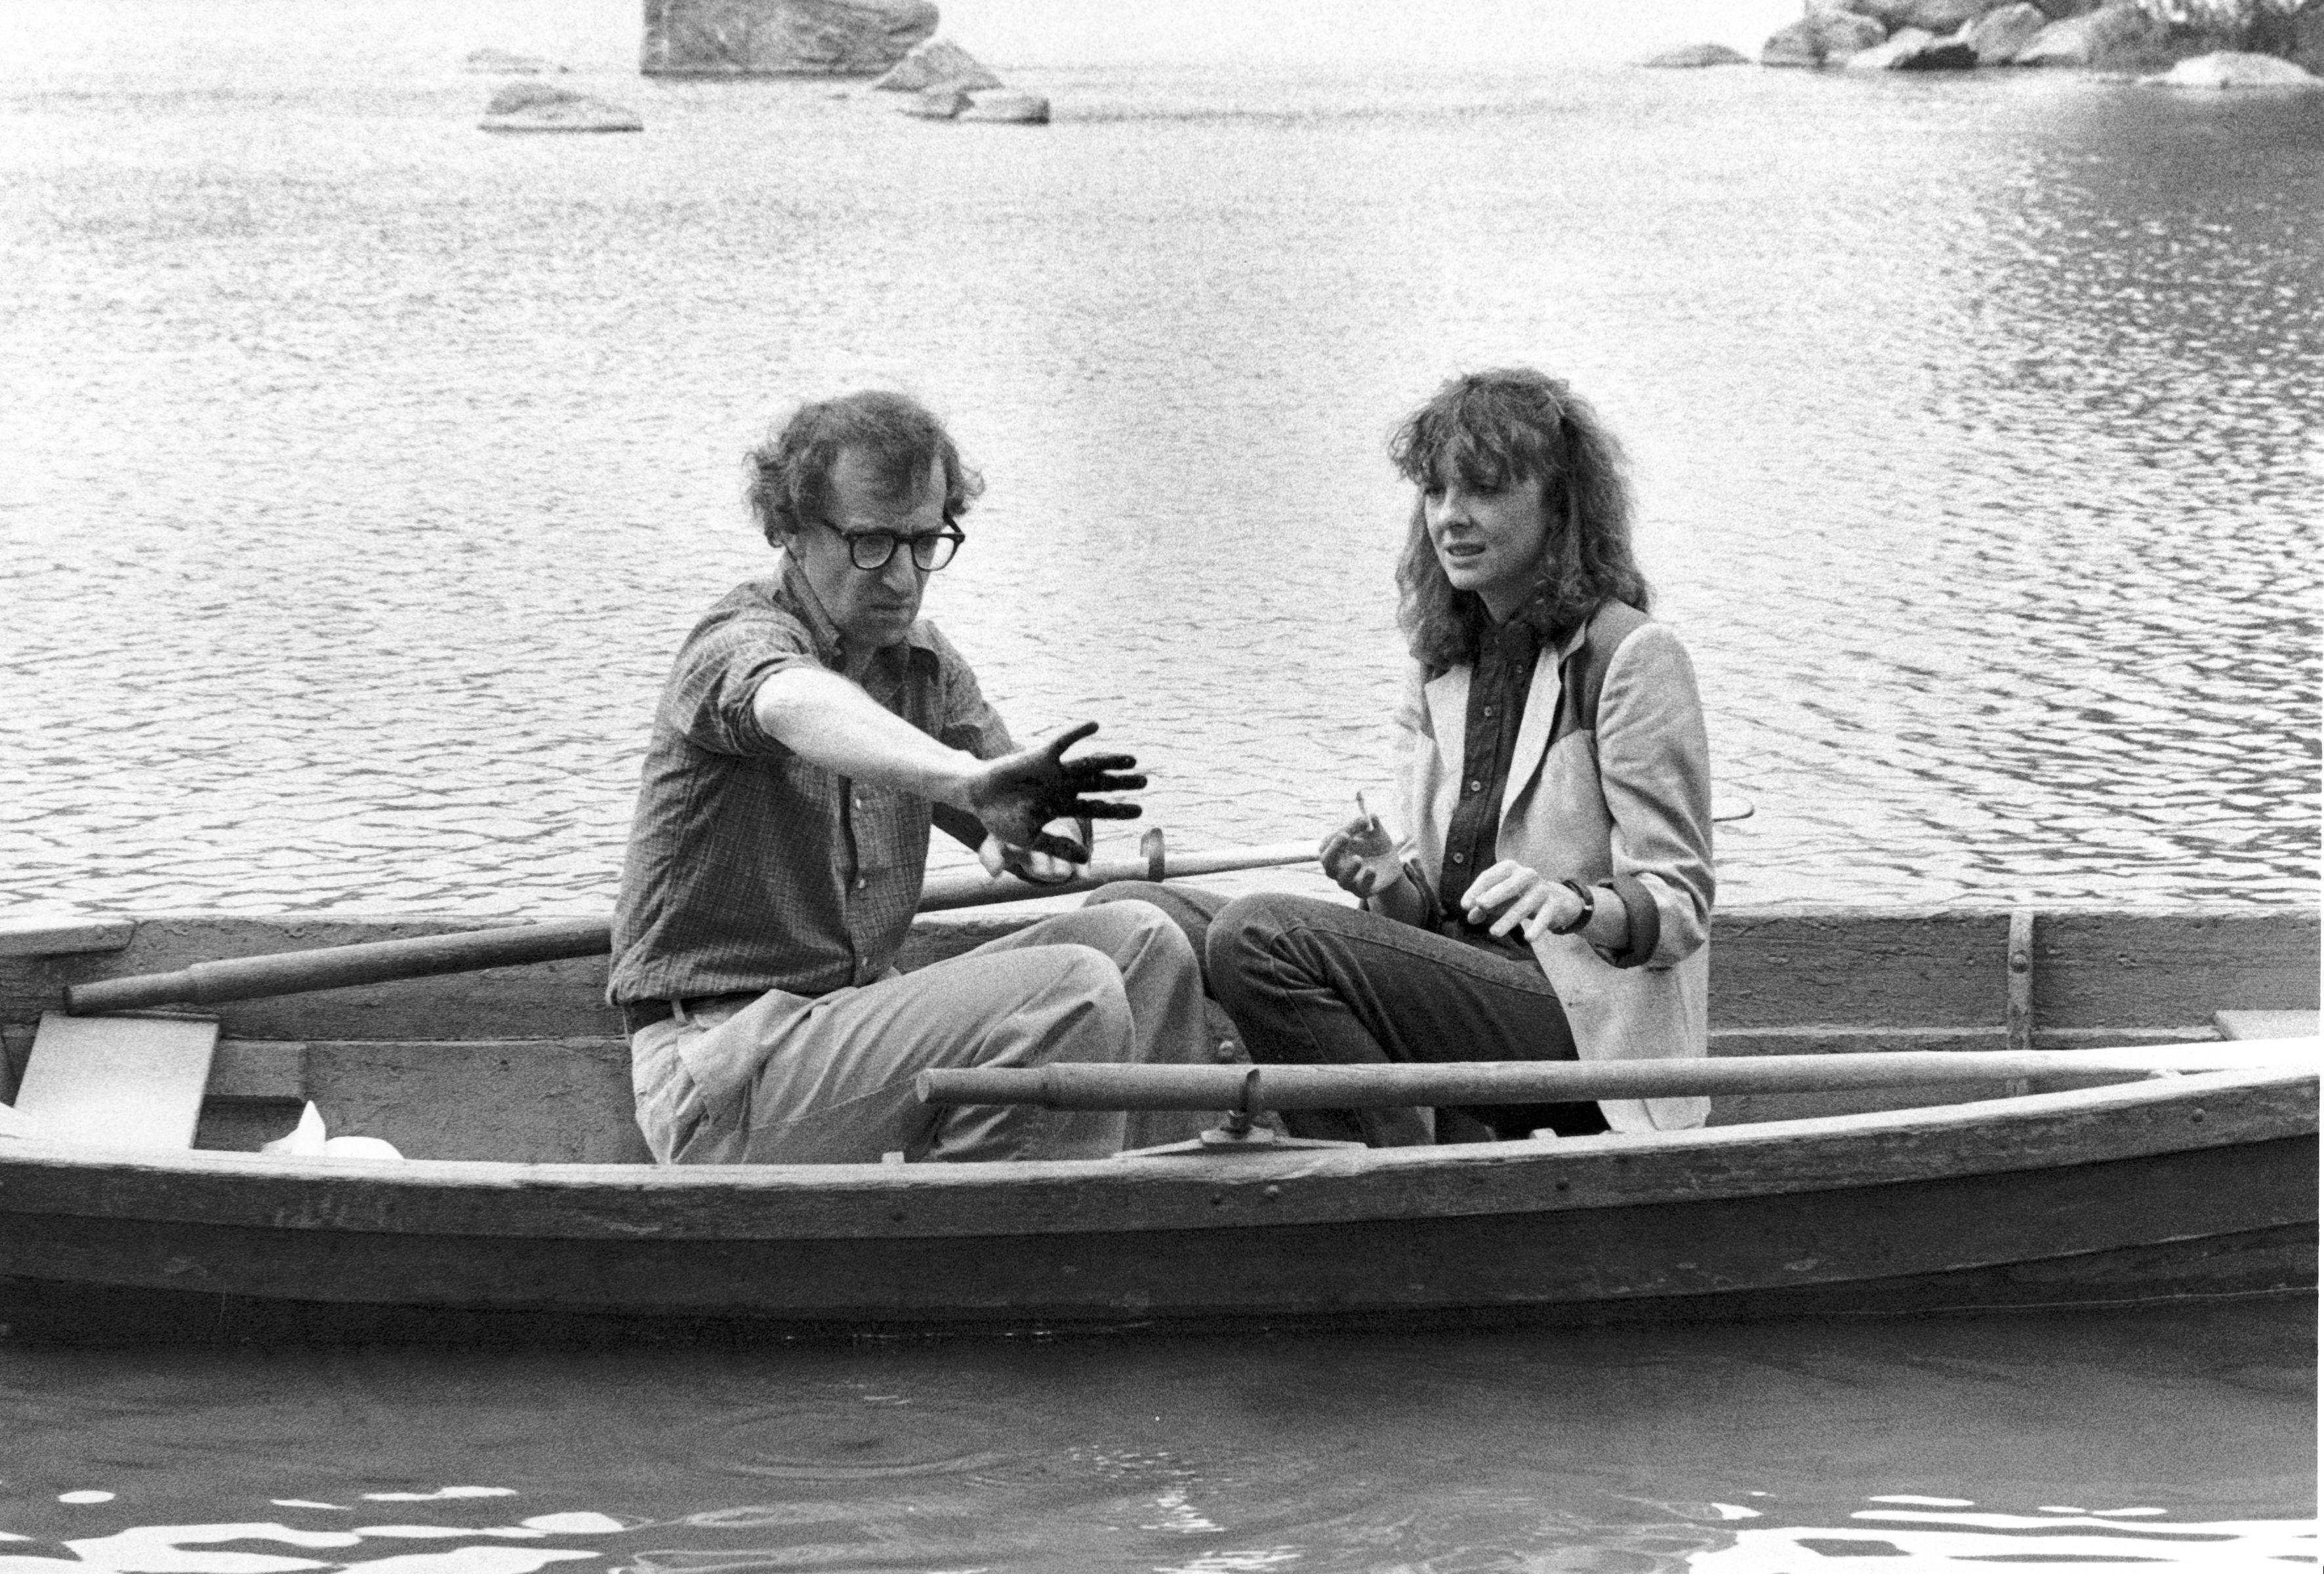 Woody Allen and Diane Keaton in Manhattan (1979)